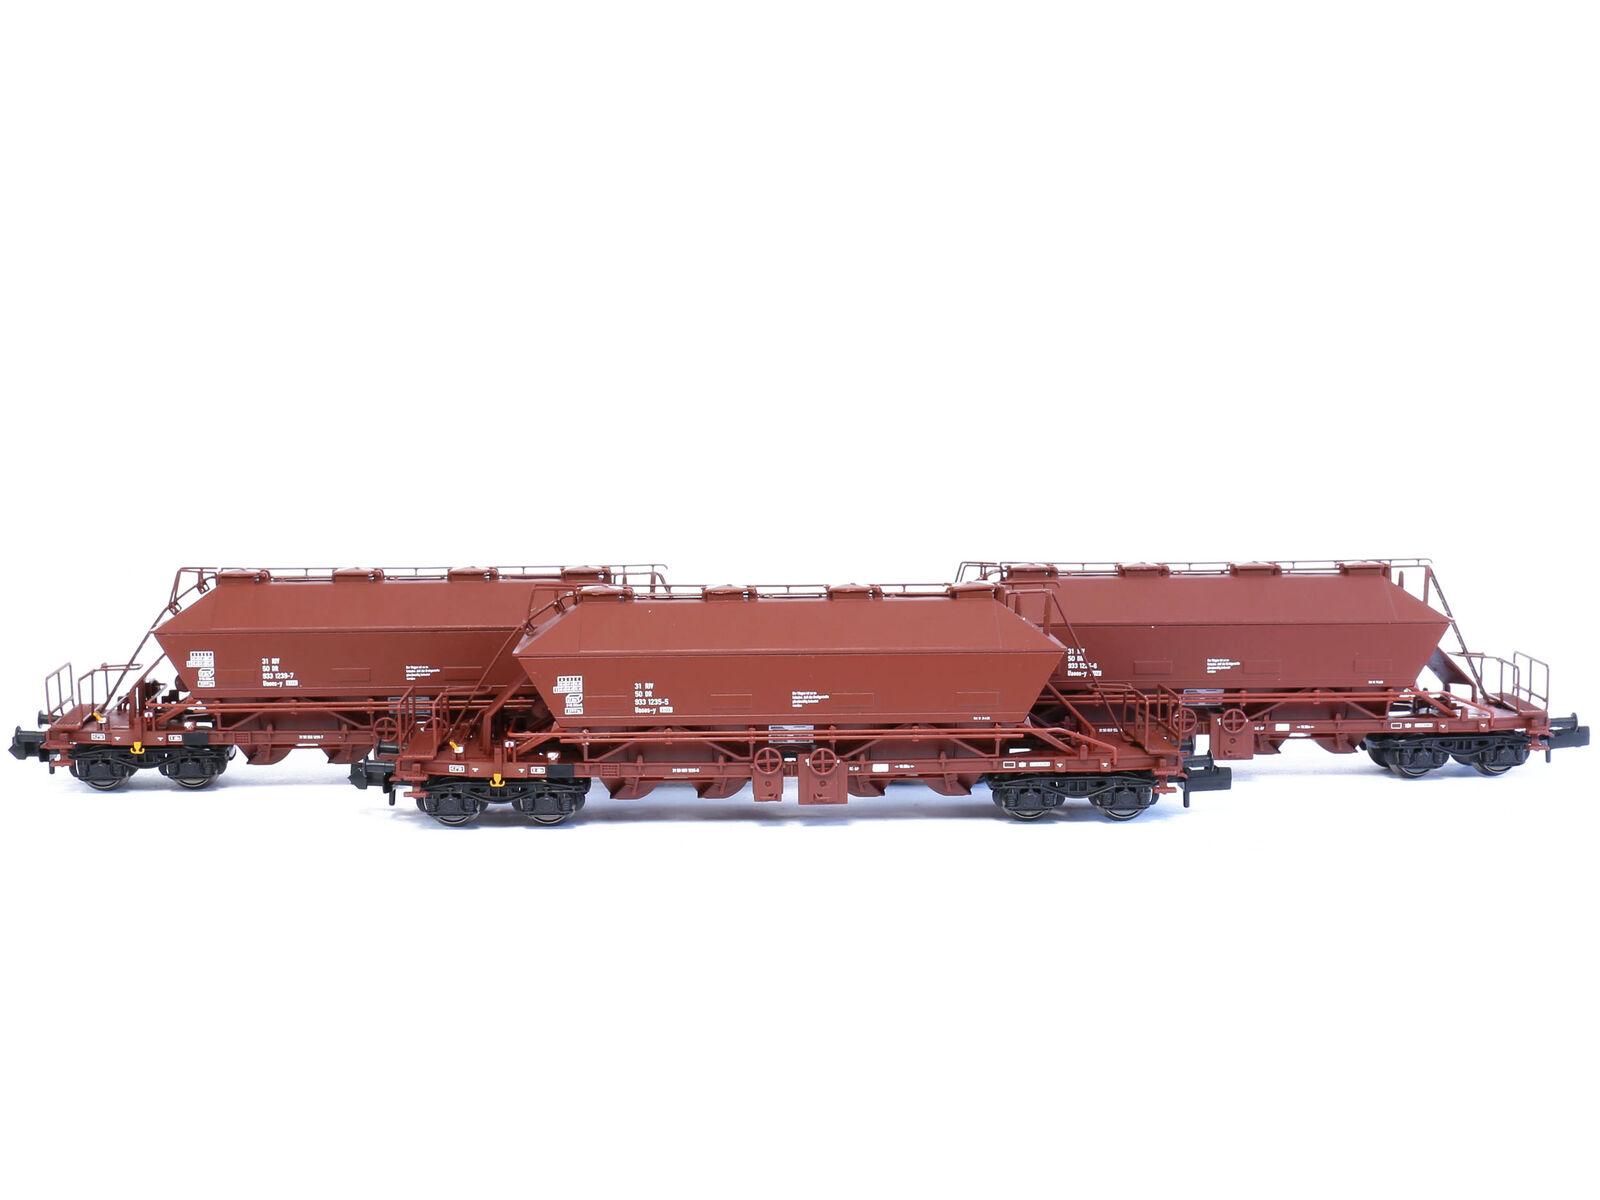 Kuehn 93014-carro merci Kali carrello uaoos 9331 DR DR DR 3x-Traccia N-NUOVO d01a9d